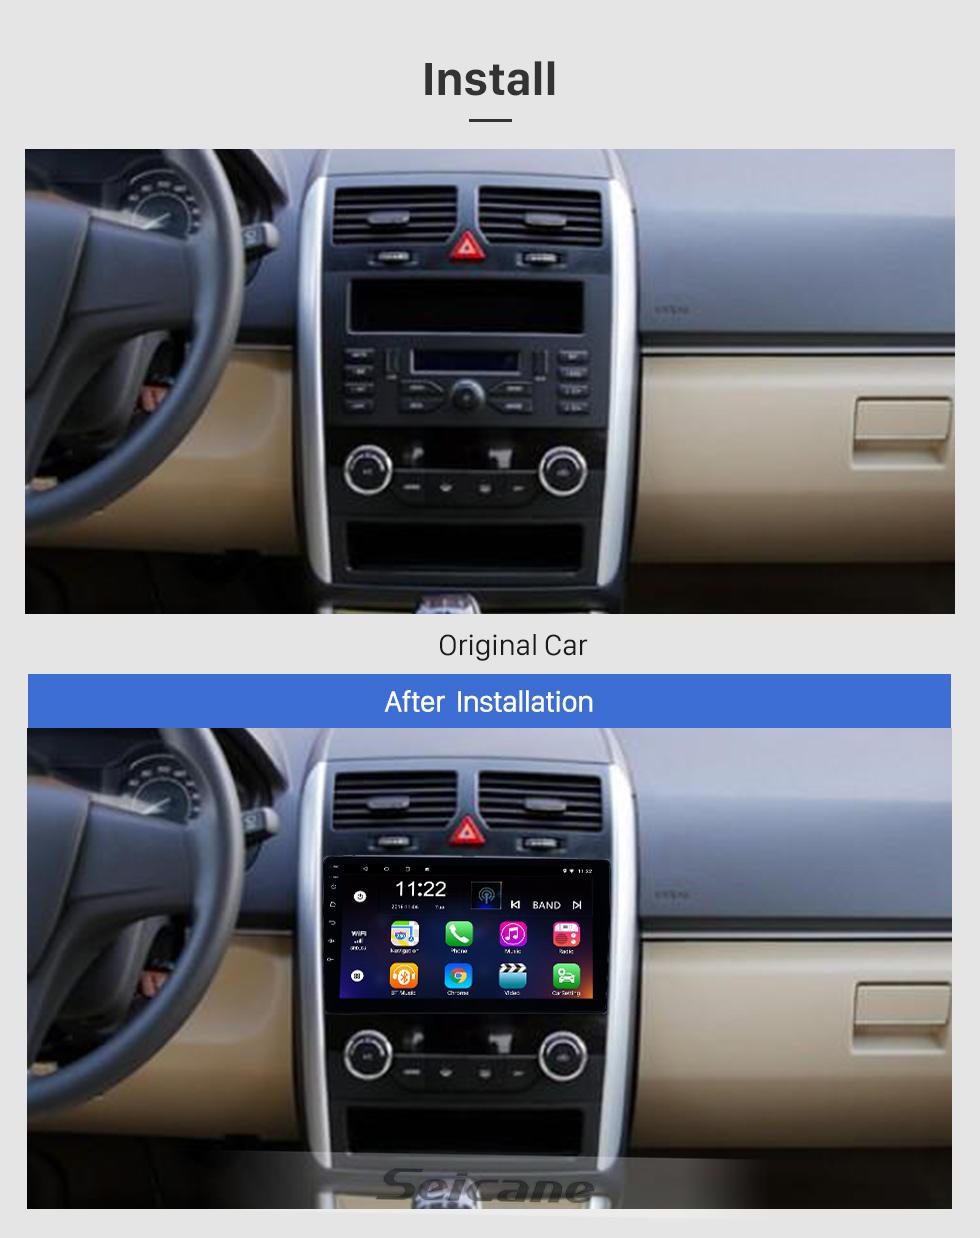 Seicane Android 8.1 9-дюймовый HD сенсорный экран GPS-навигация Радио для 2016-2017 Baic E Series E130 E150 / EV Series EV160 EV200 / Senova D20 с поддержкой Bluetooth Carplay Резервная камера